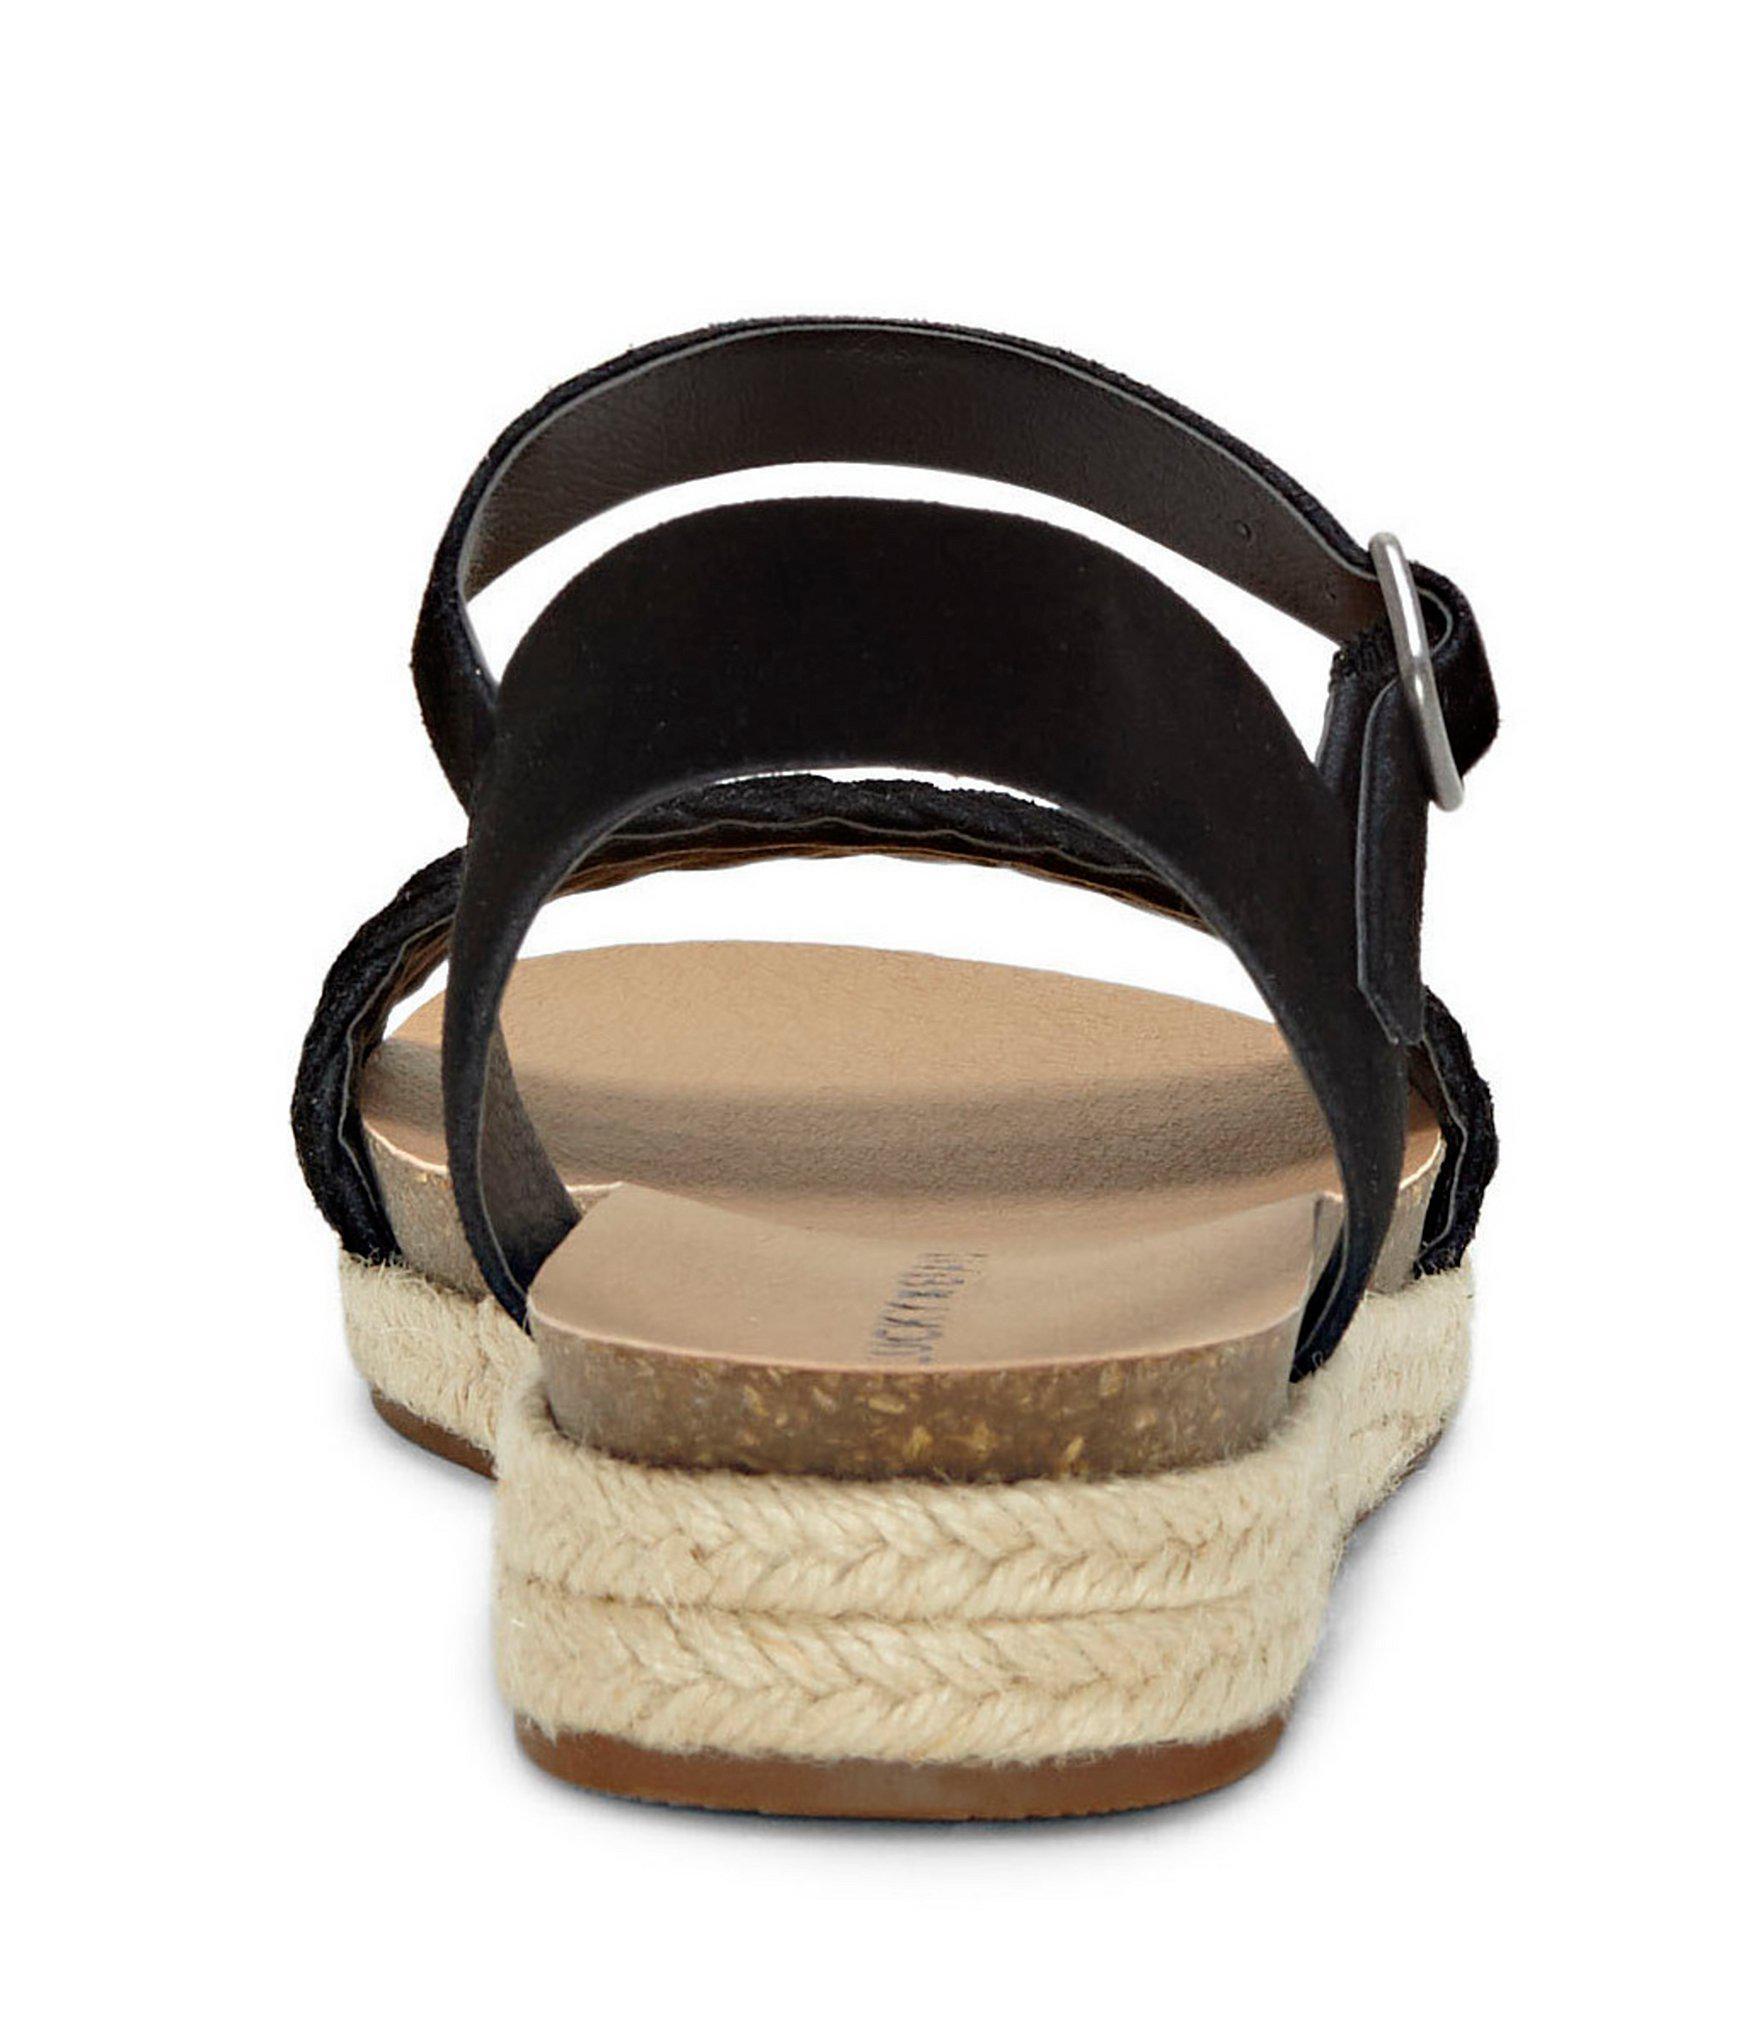 Genette Suede Espadrille Sandals